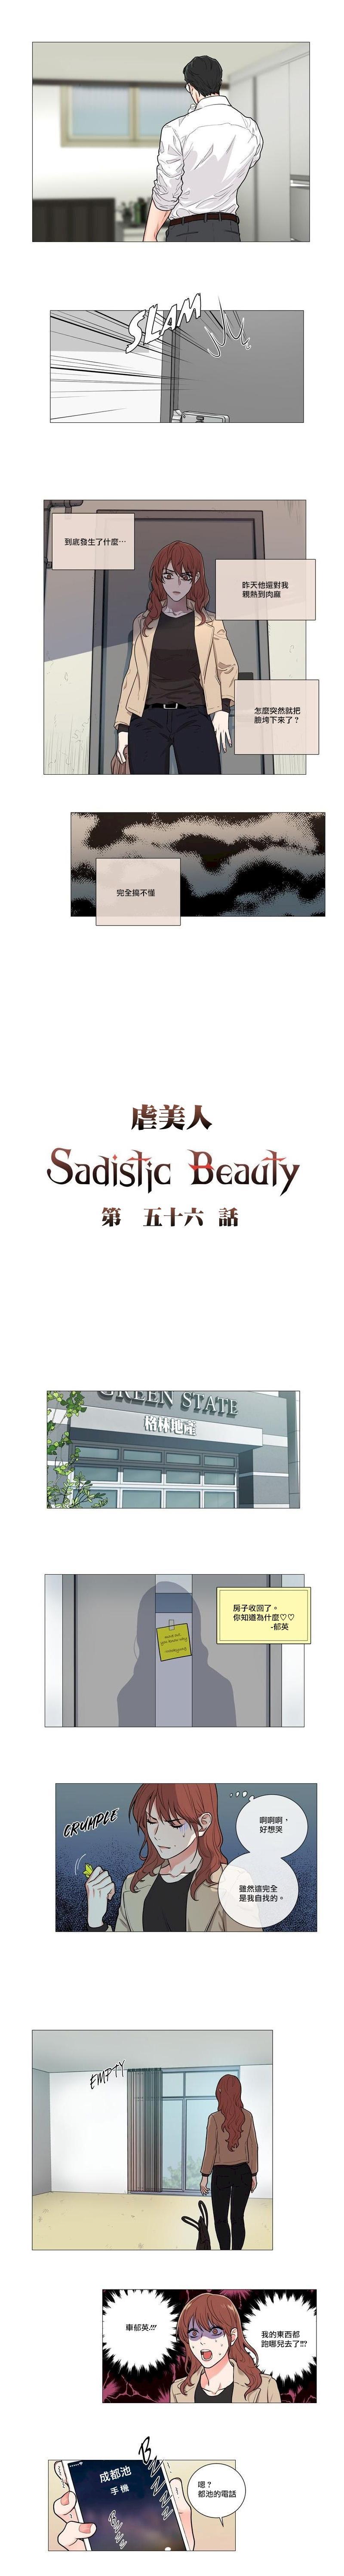 Sadistic Beauty   虐美人 Ch.52-56 36